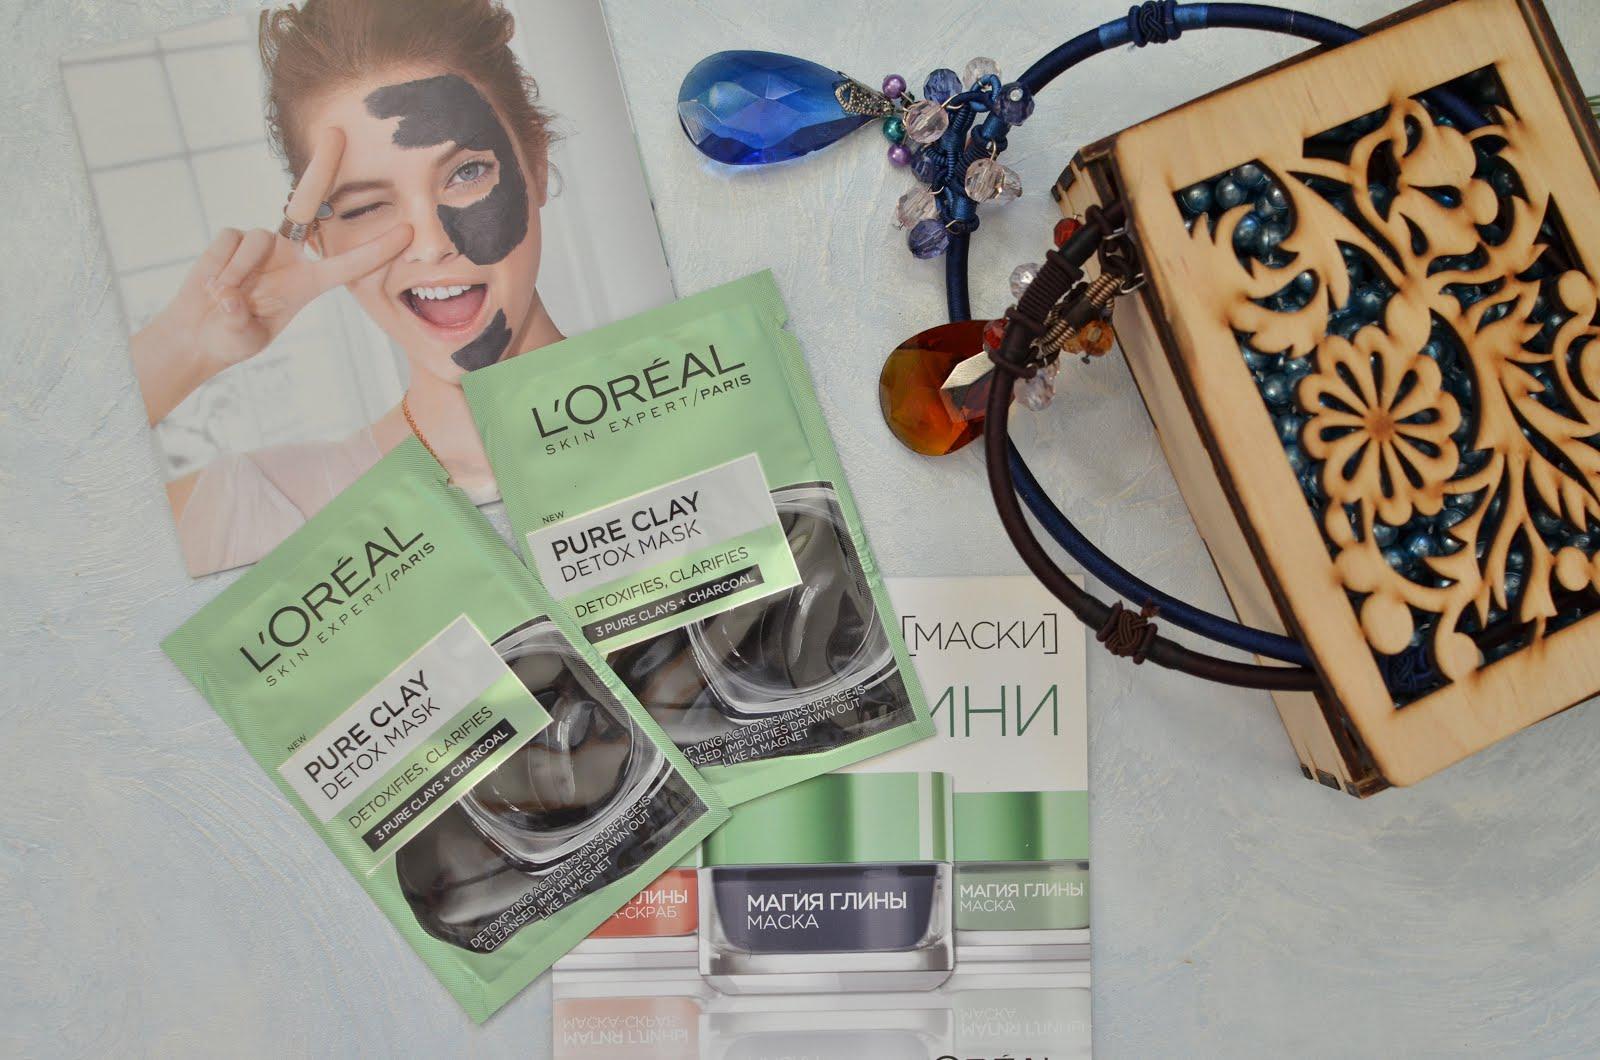 L'Oreal Paris Skin Expert  Маска для лица Магия глины Детокс и сияние